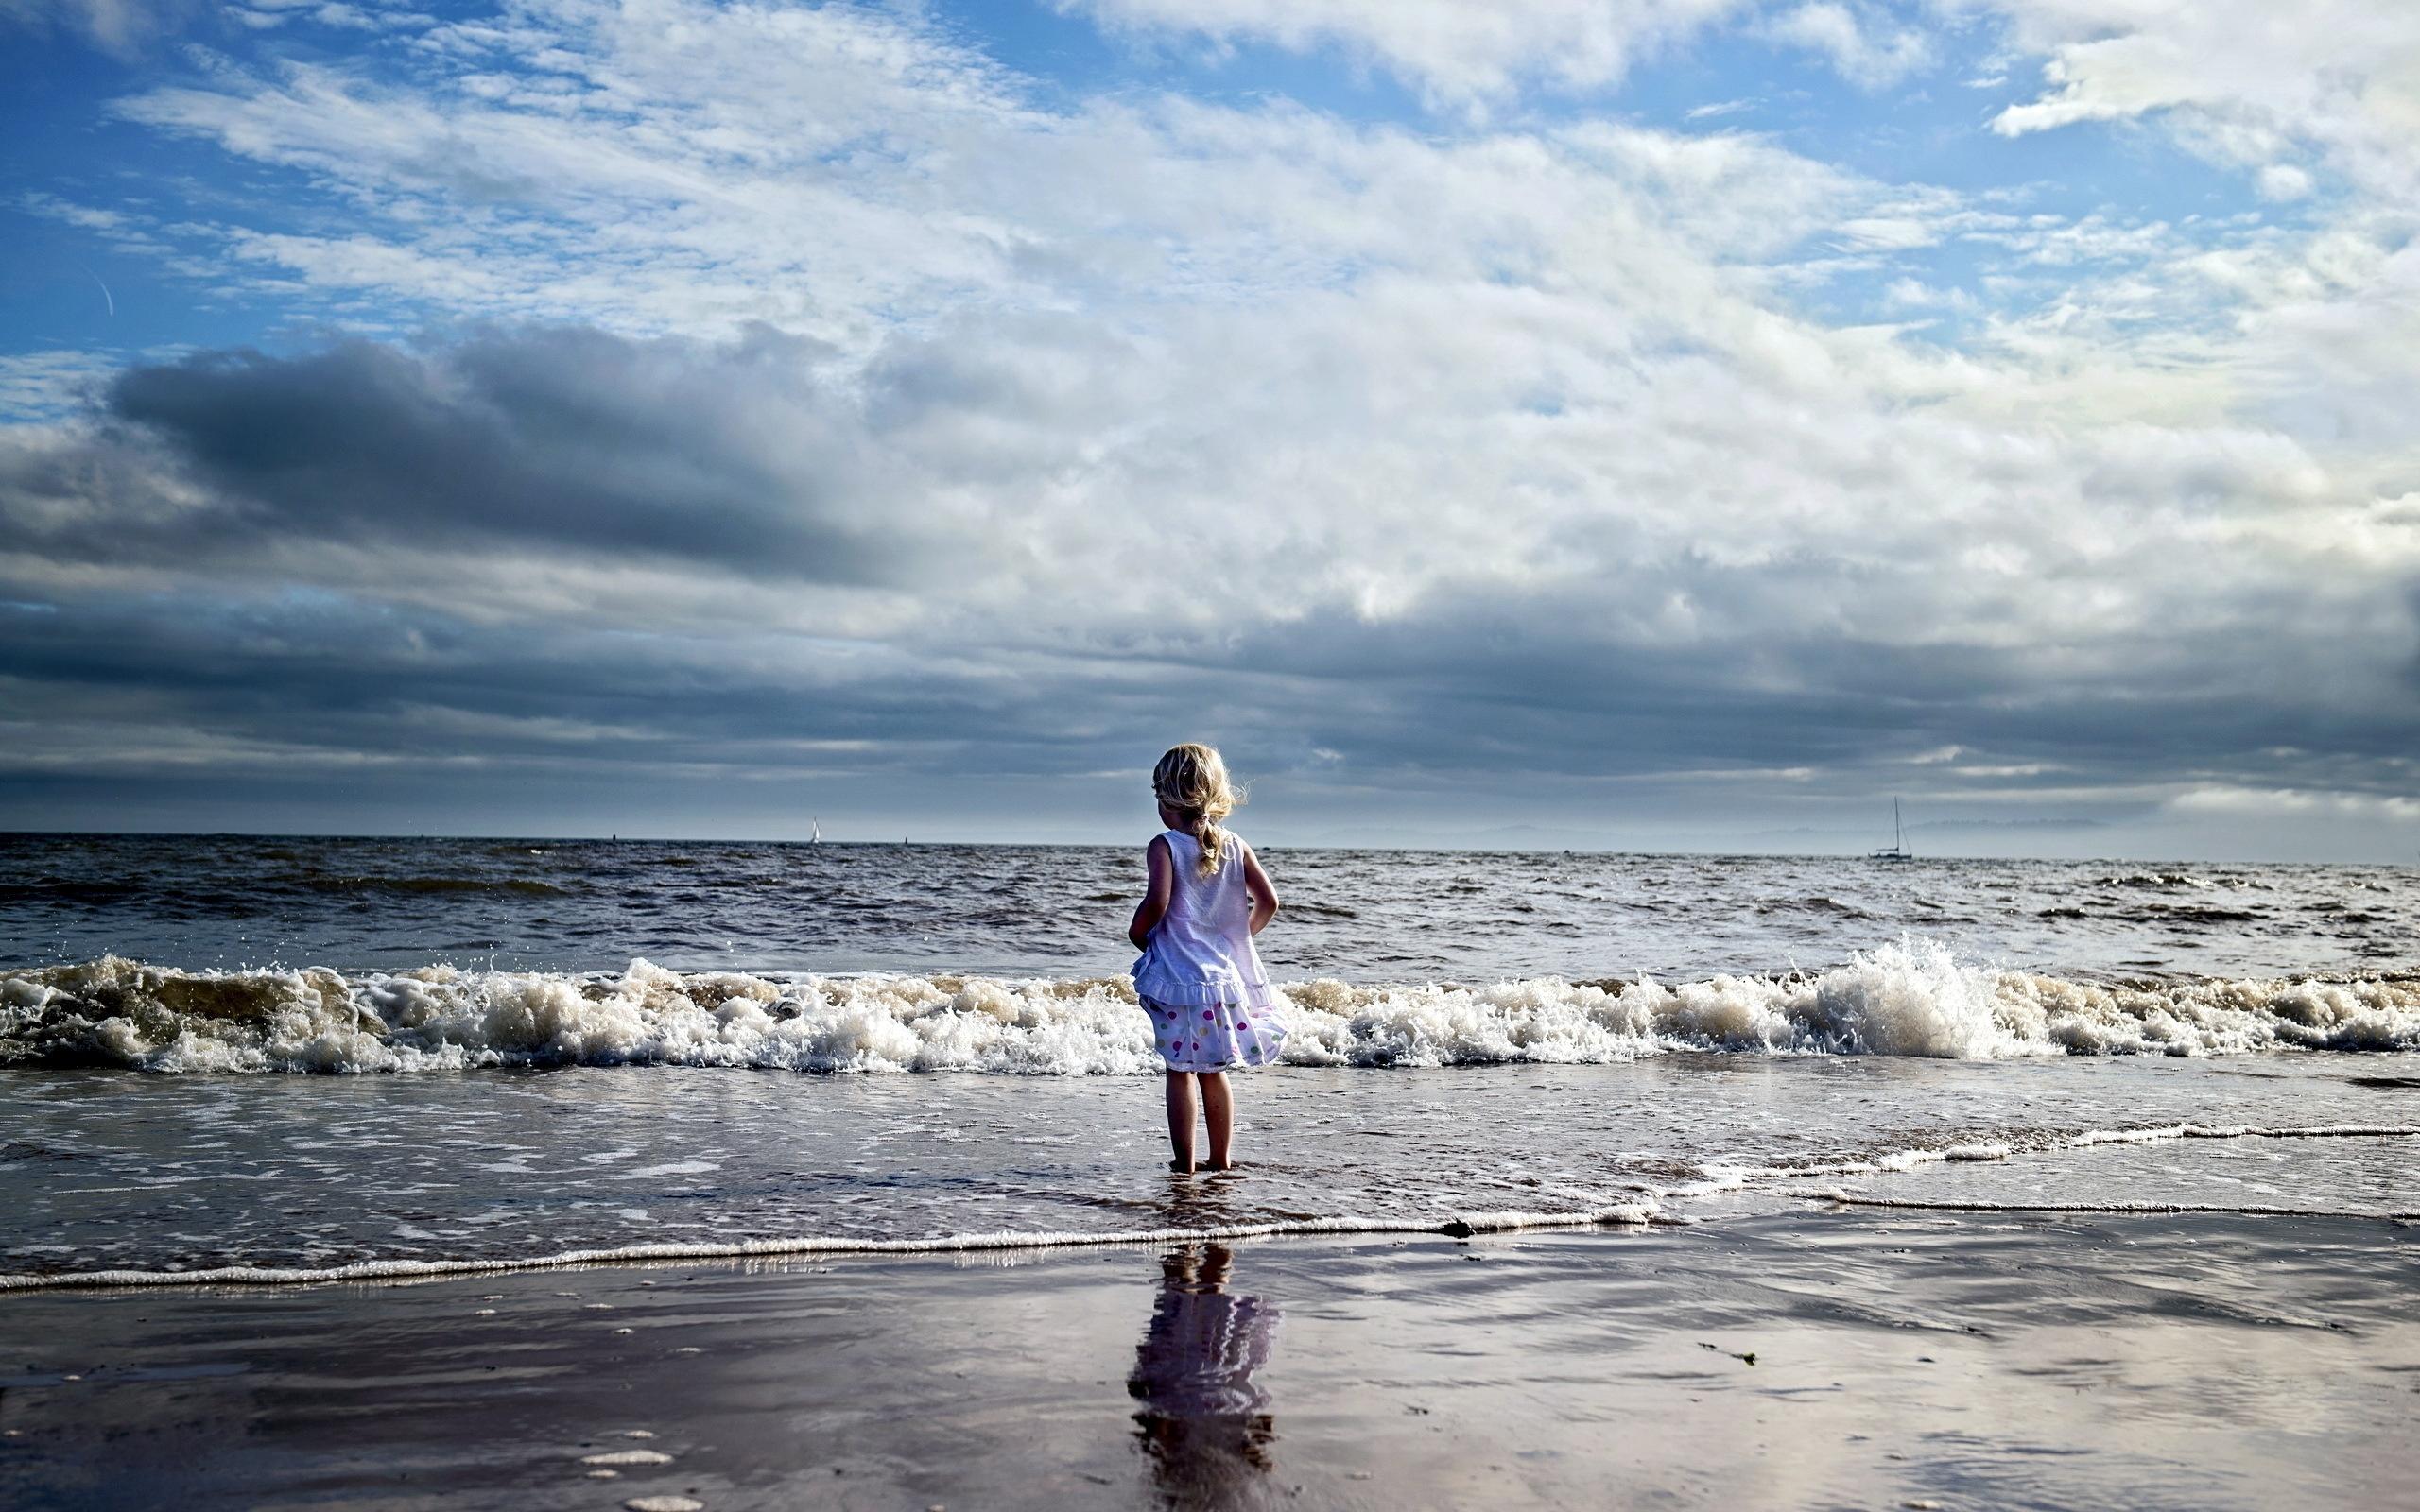 красивая девушка на берегу океана - 3